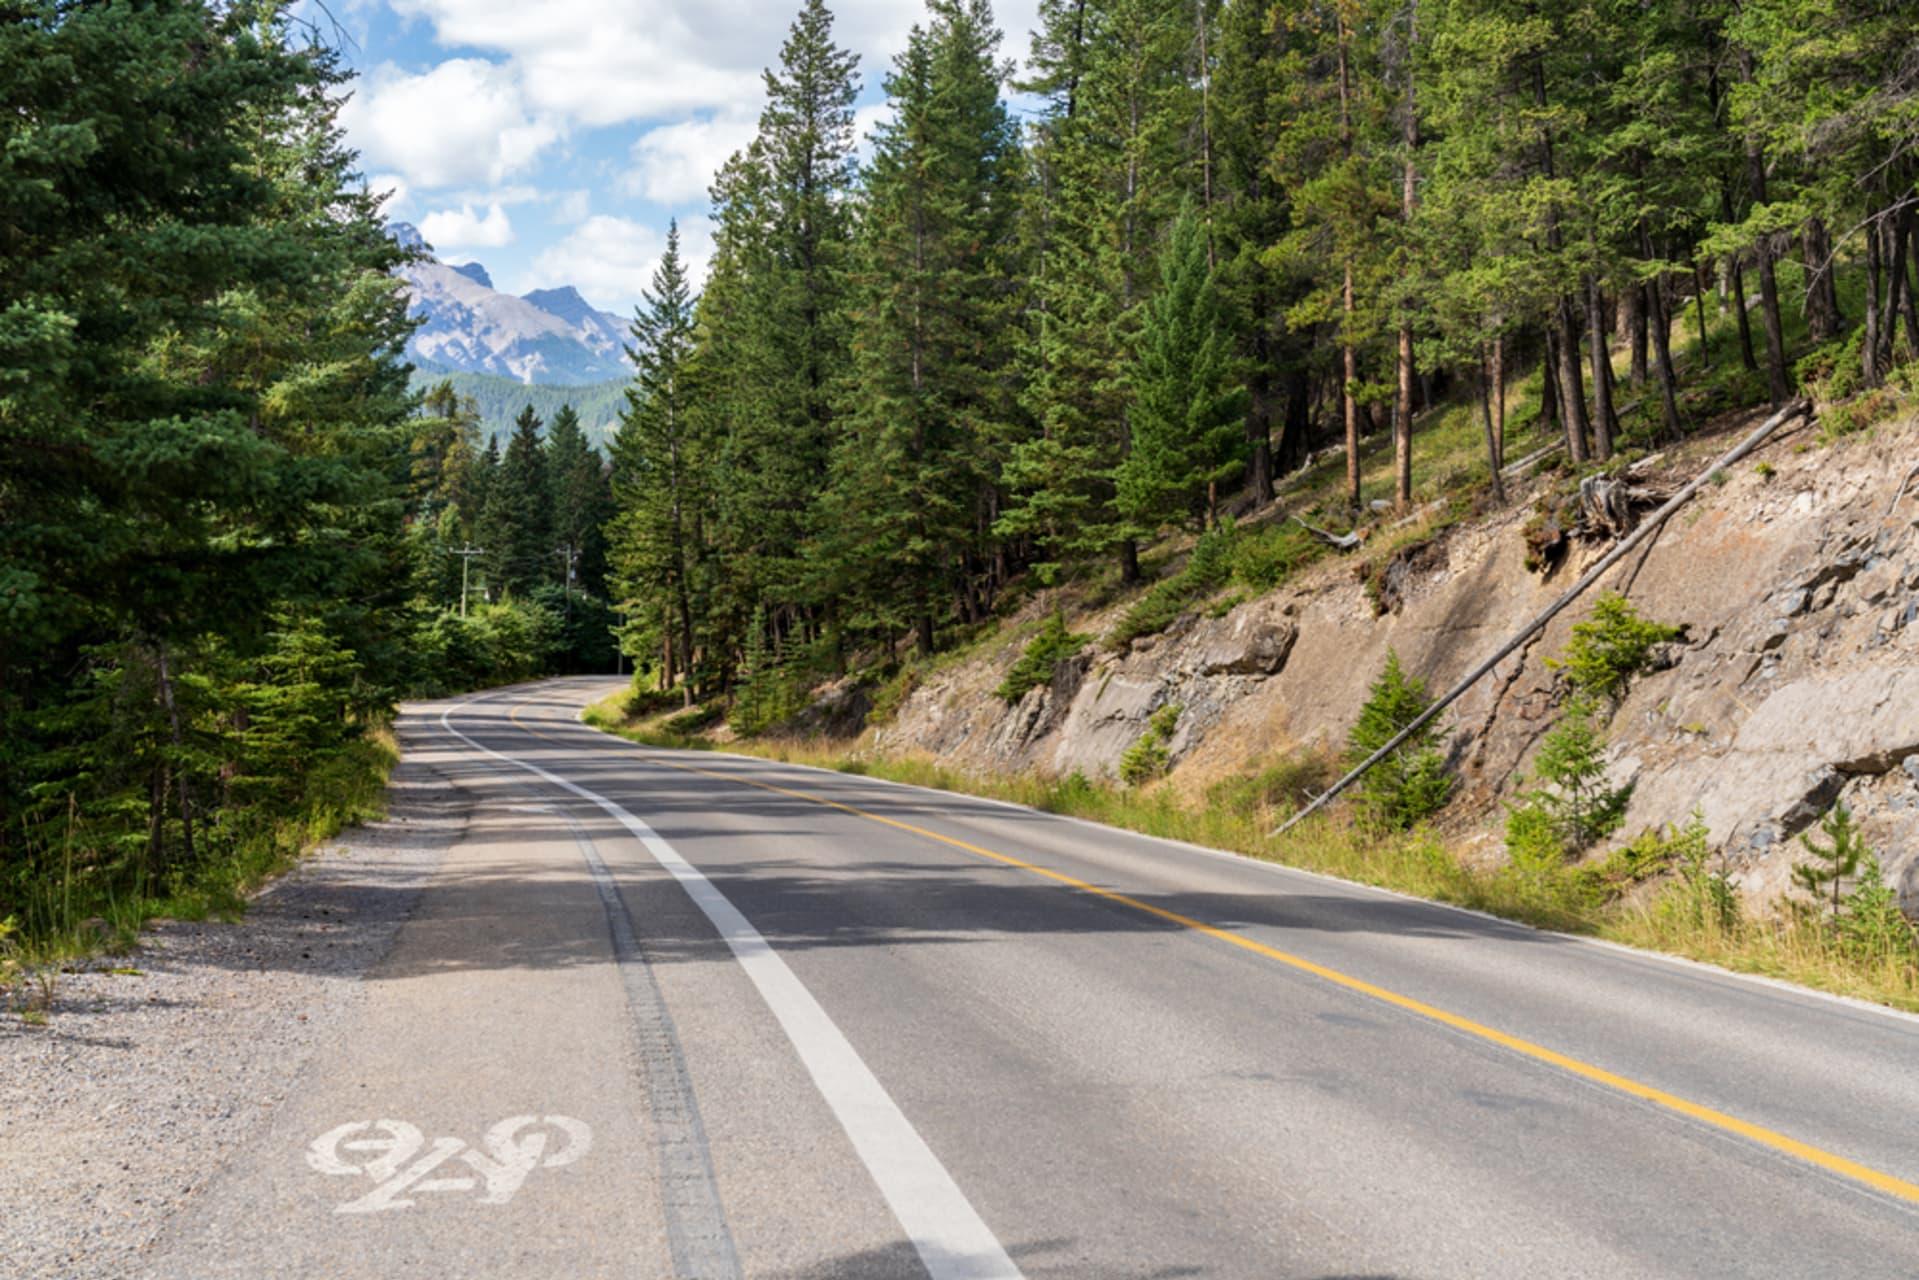 Banff - Biking through Banff